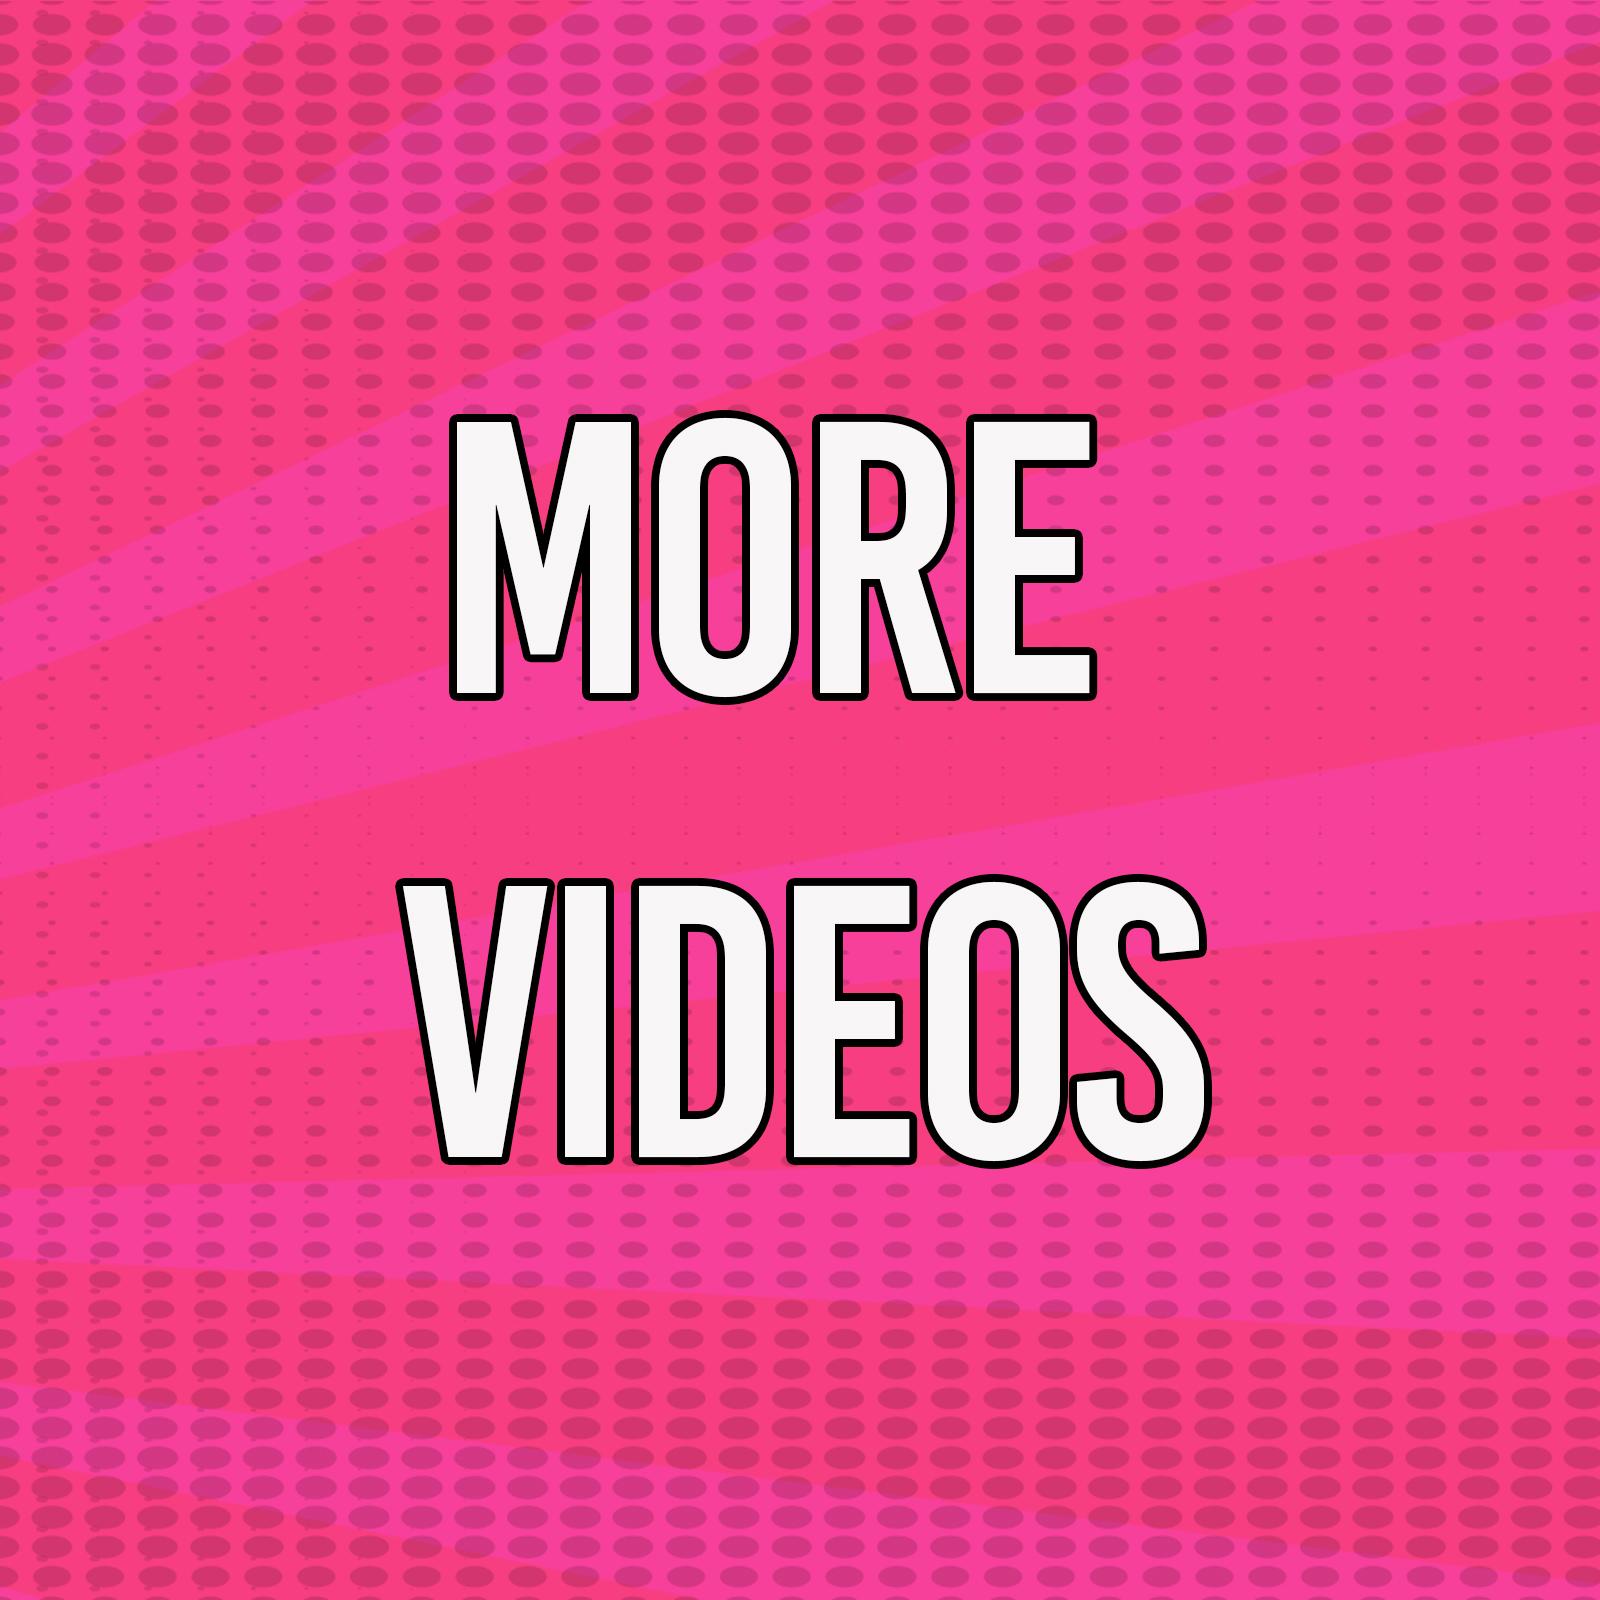 More videos.jpg